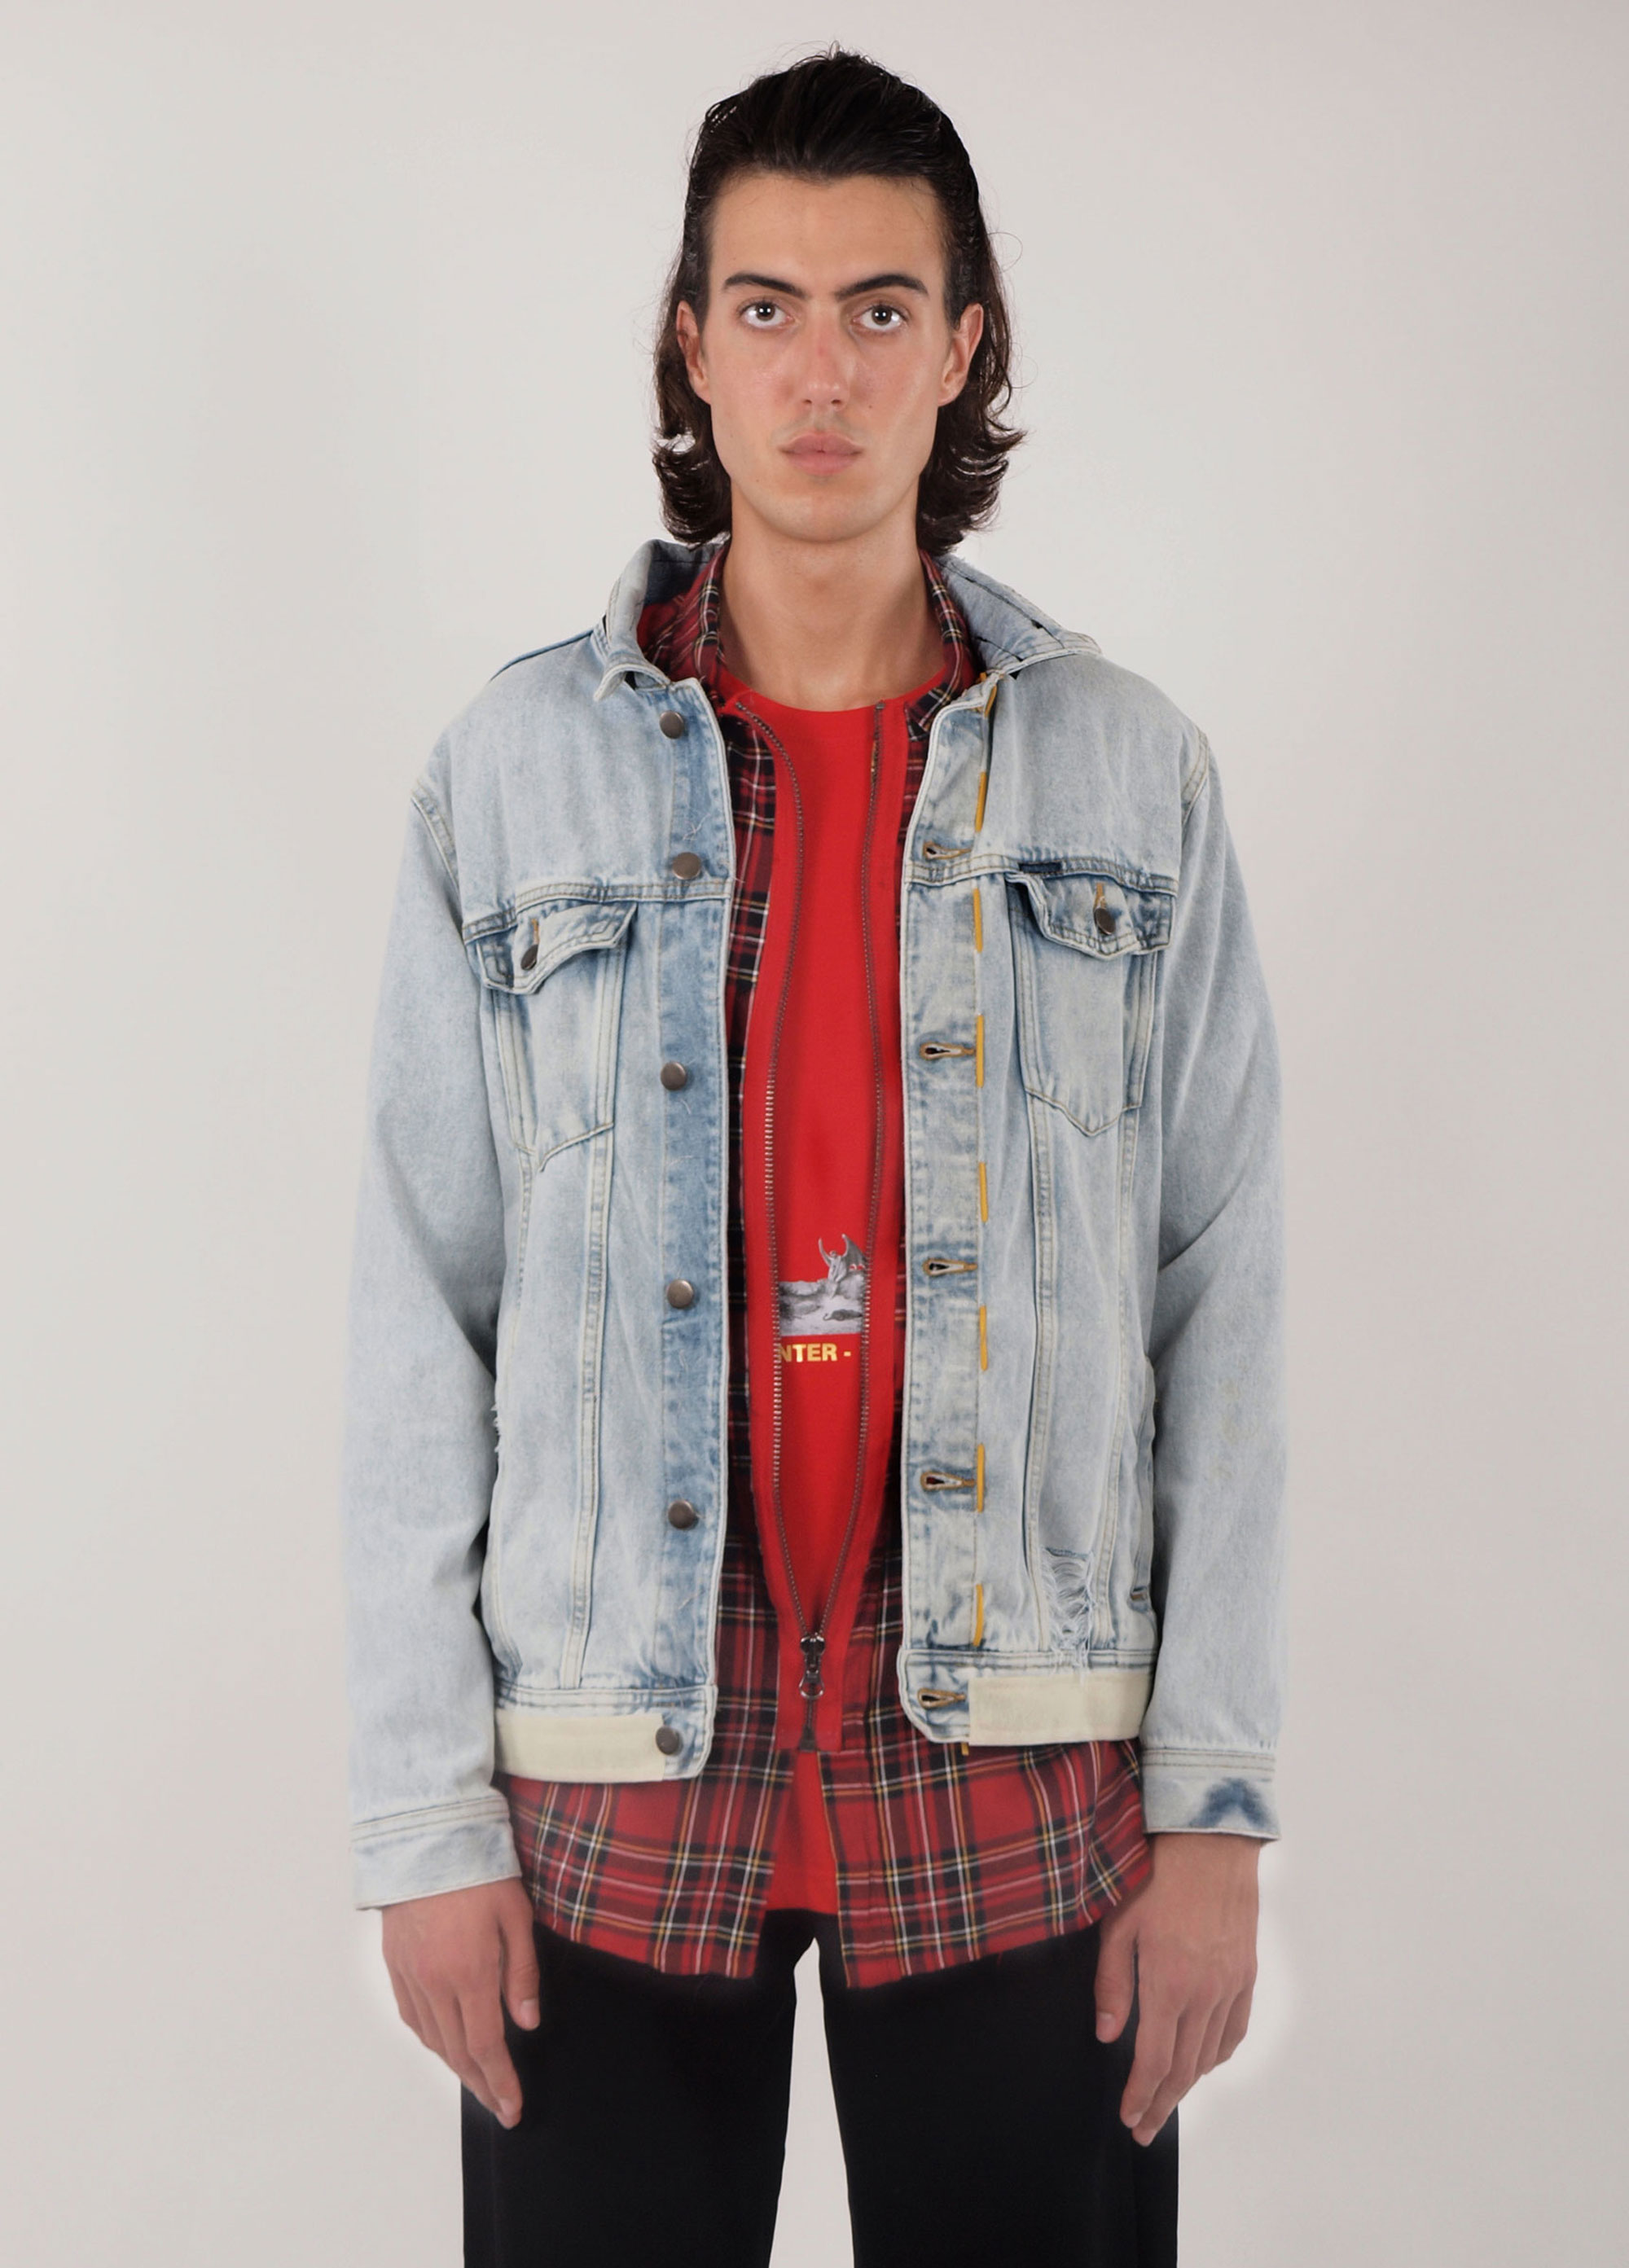 inferno-lust-jacket.jpg